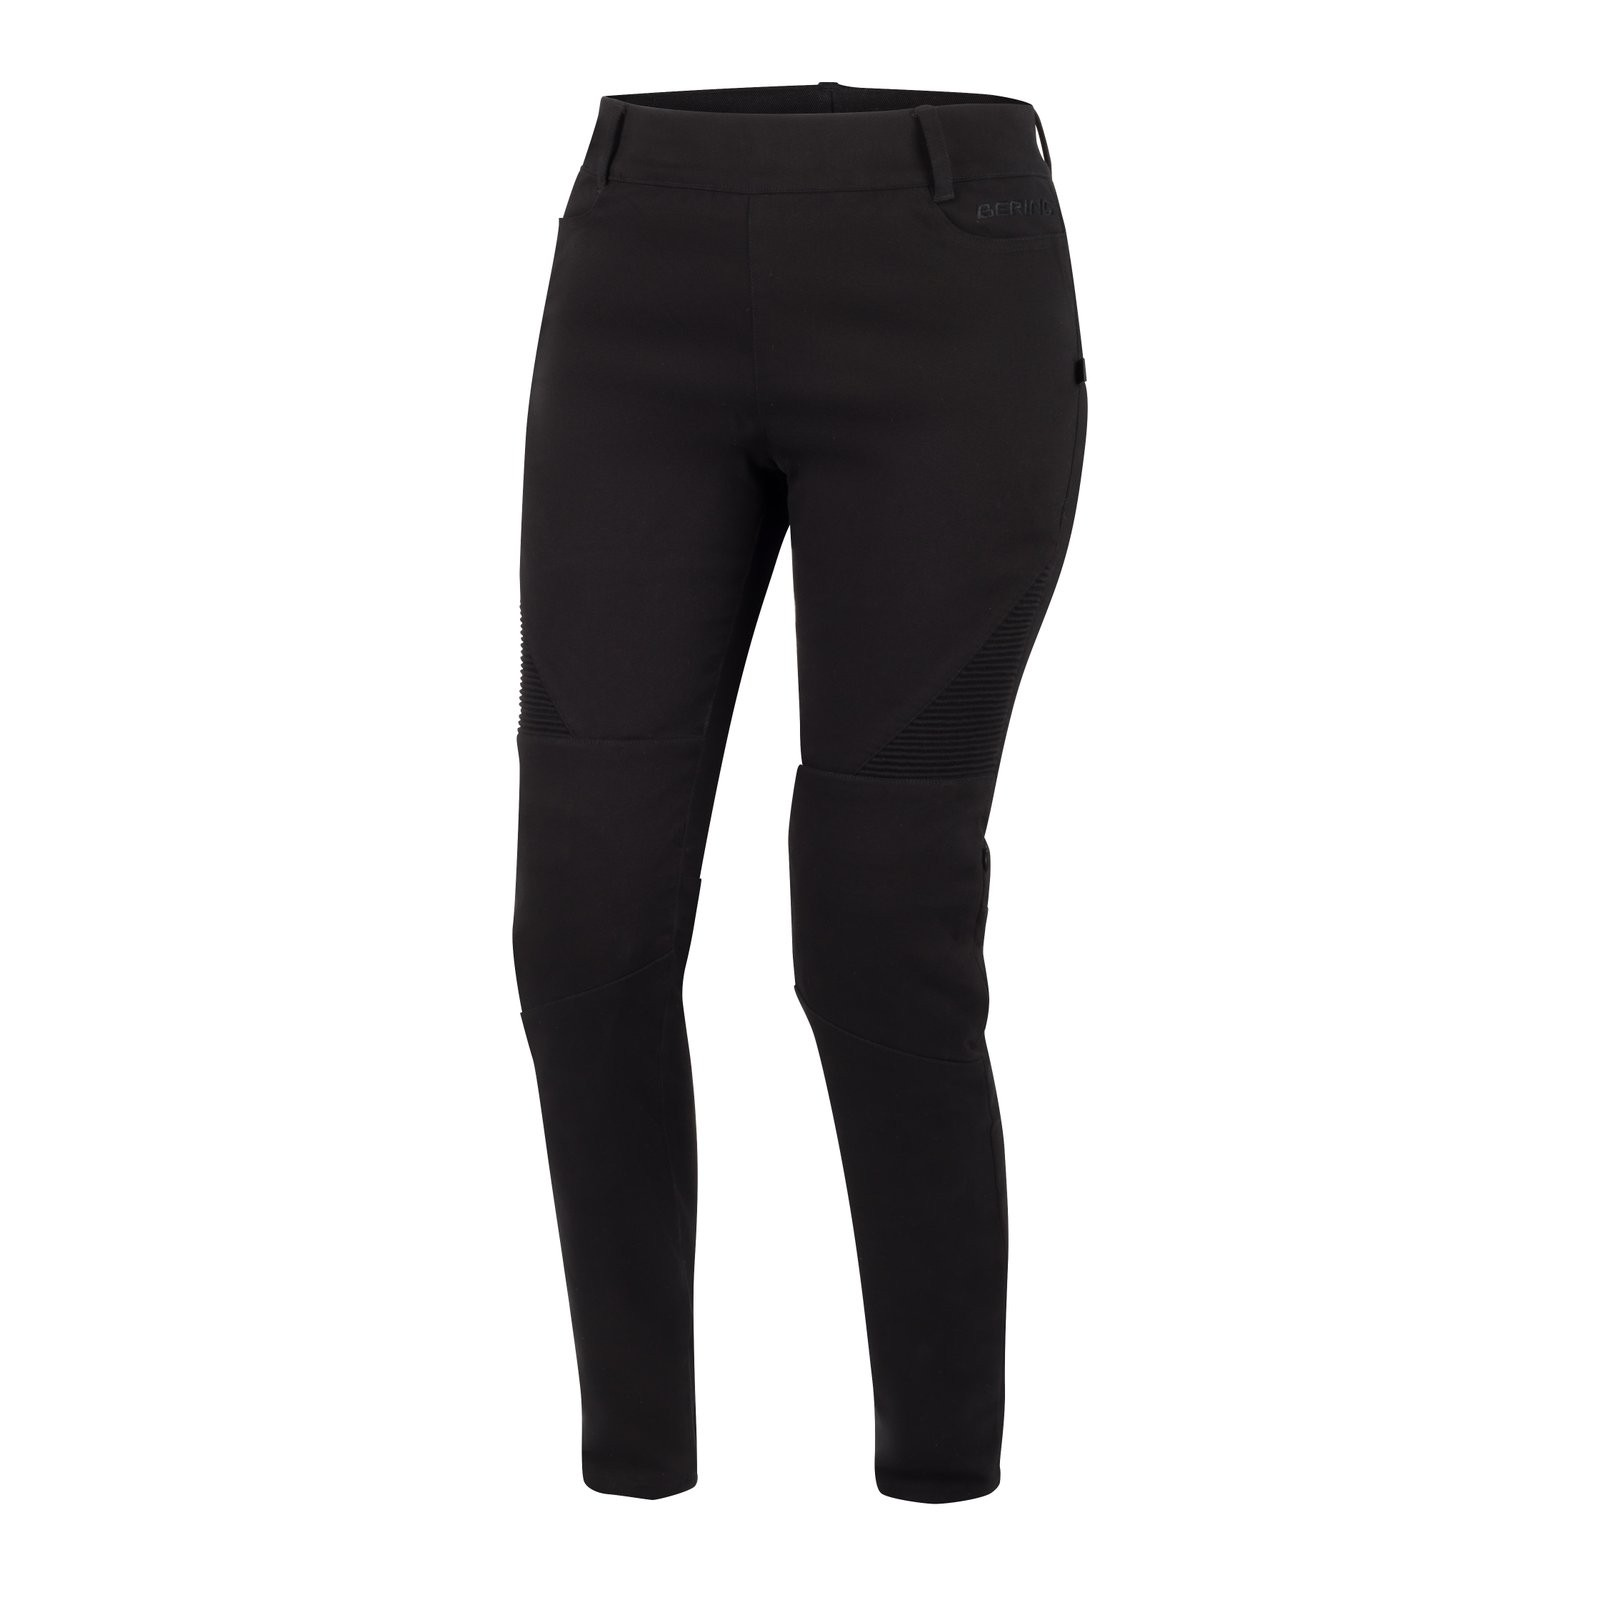 Pantalon LADY PEGGY Noir / BTP620